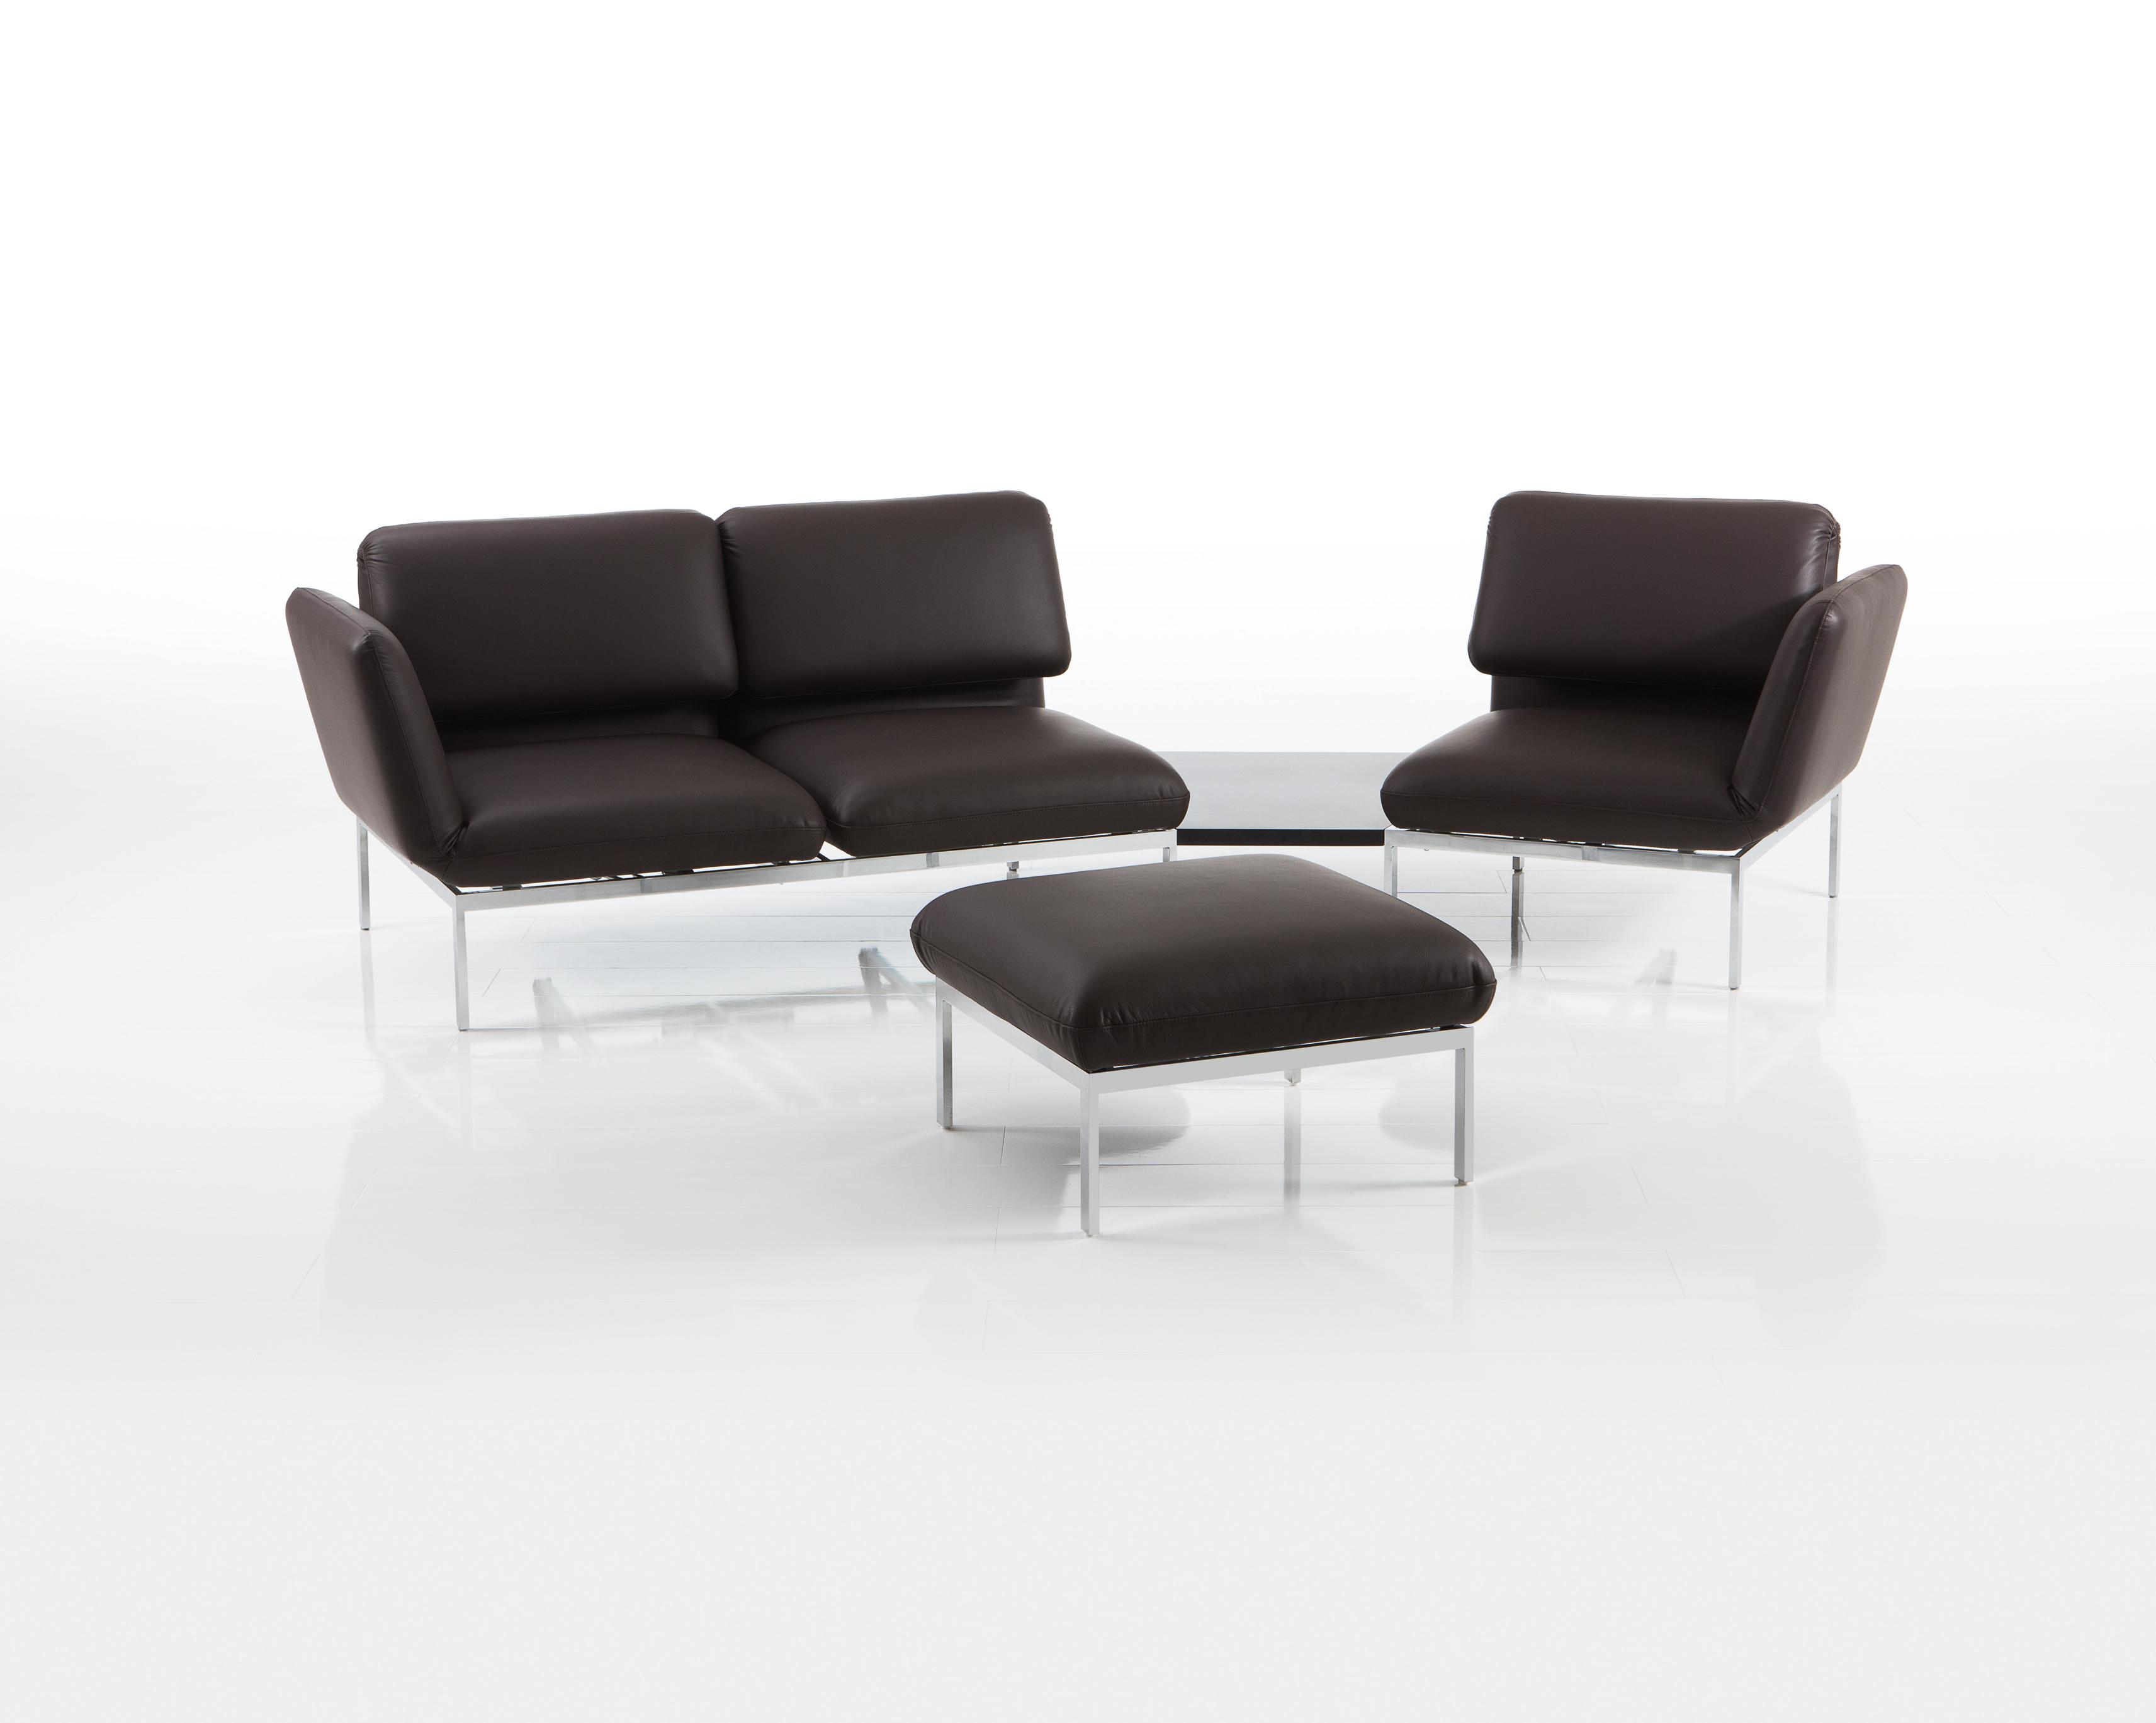 sofa roro medium von br hl sippold. Black Bedroom Furniture Sets. Home Design Ideas